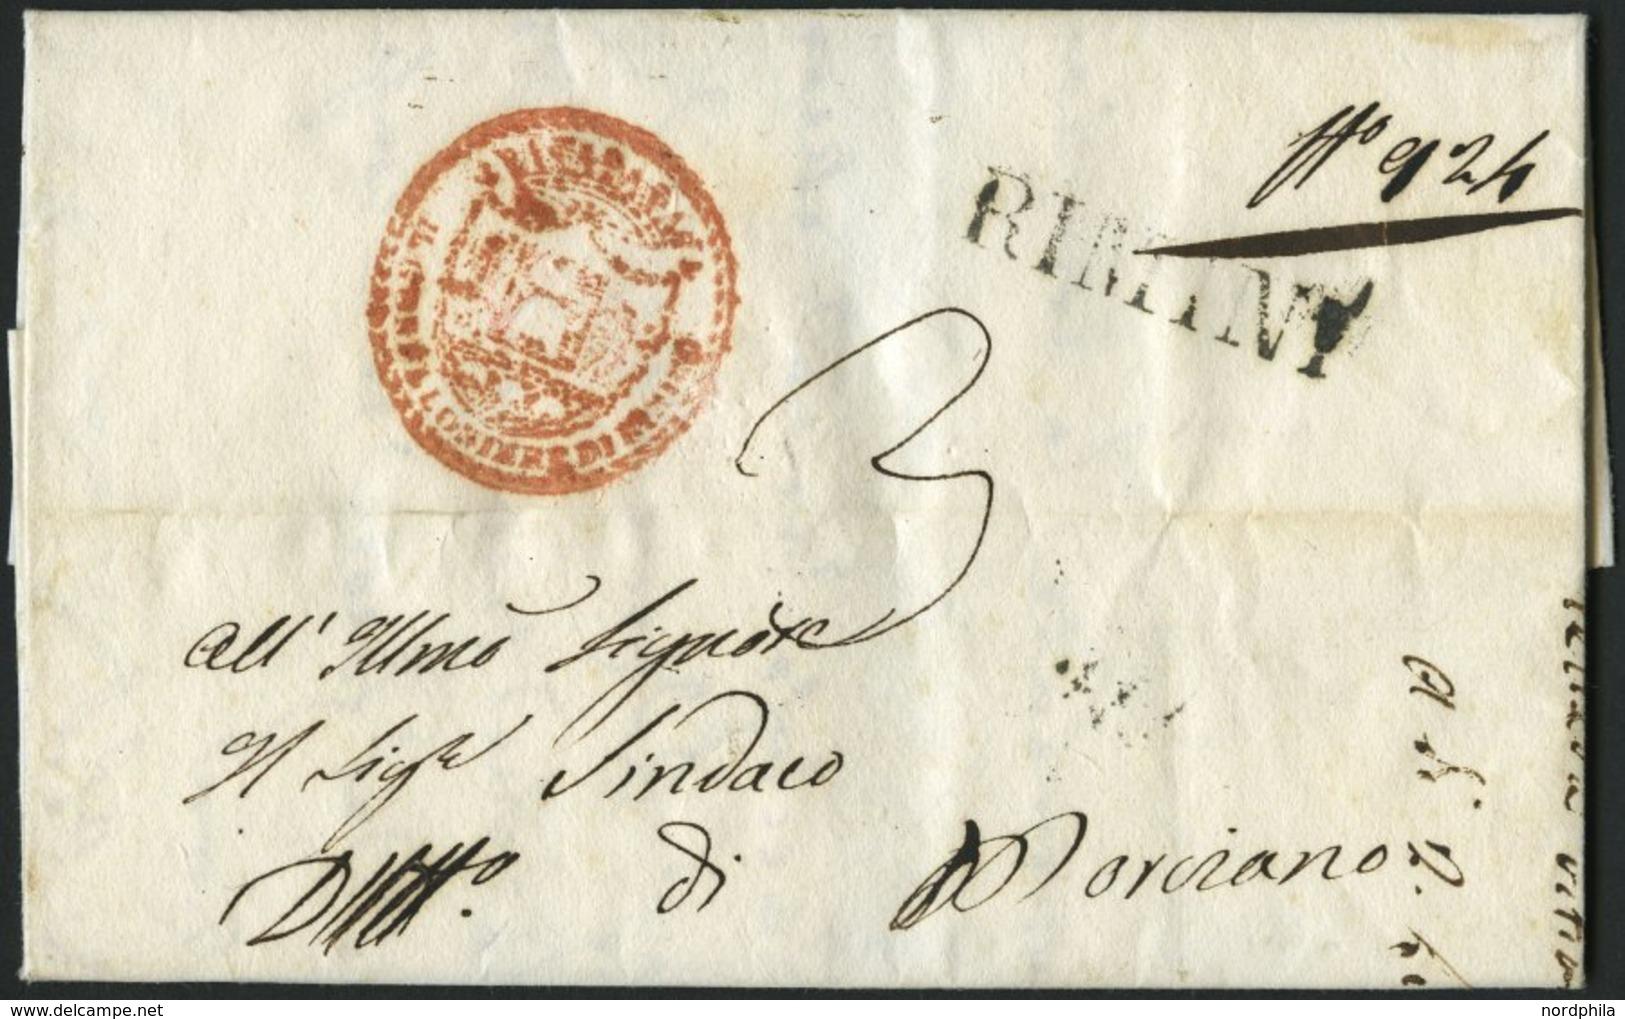 VORPHILA 1829, RIMINI, L1, Rückseitiger L2 28 GIVGNO, Dazu Dekorativer Roter Absenderstempel, Pracht - Italien